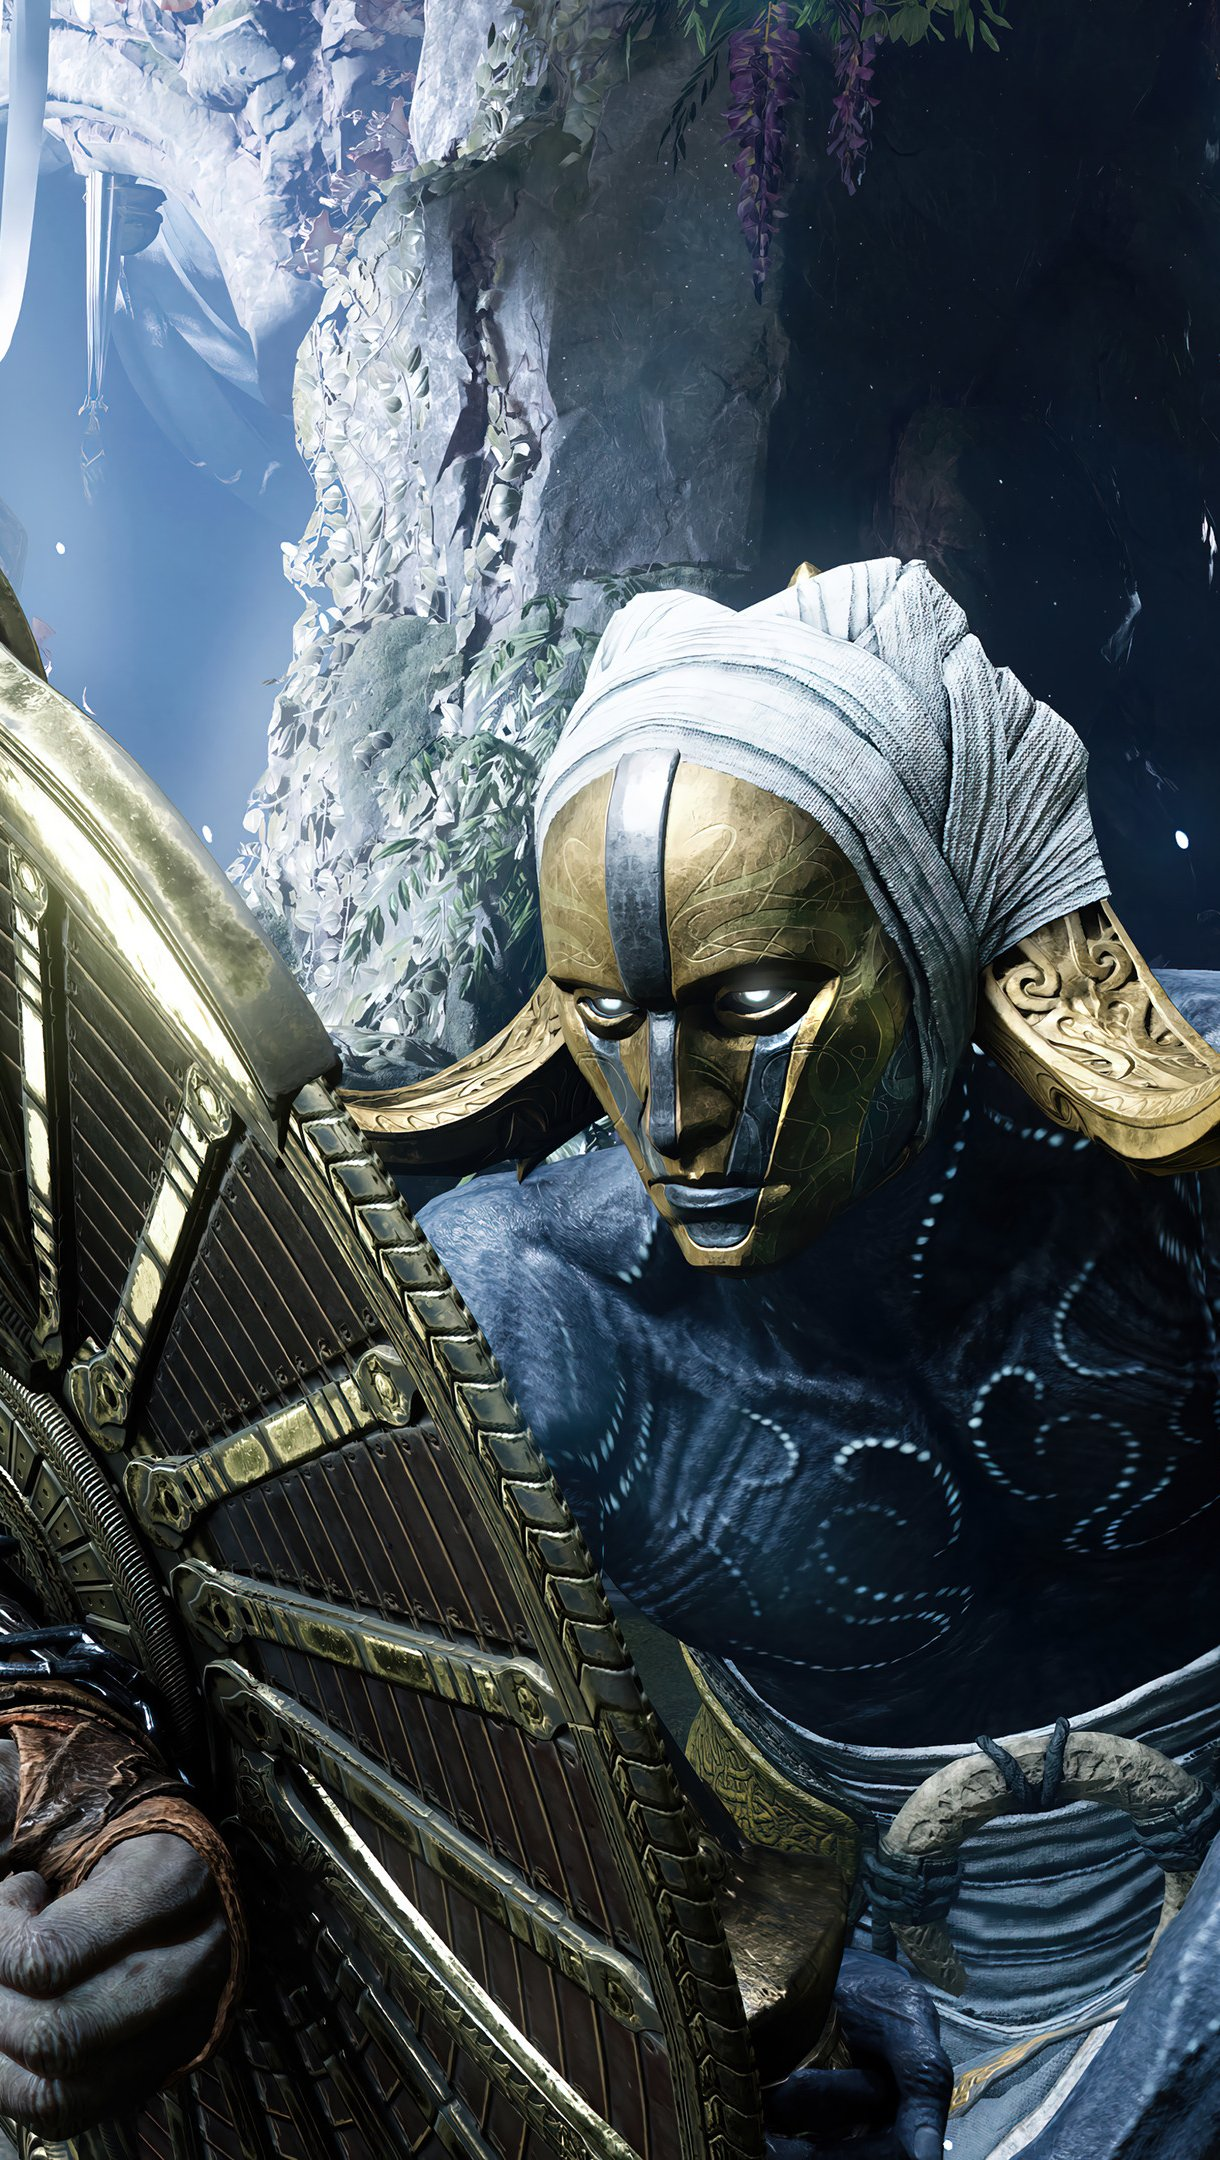 Fondos de pantalla Kratos y Ragnarok God of War Vertical